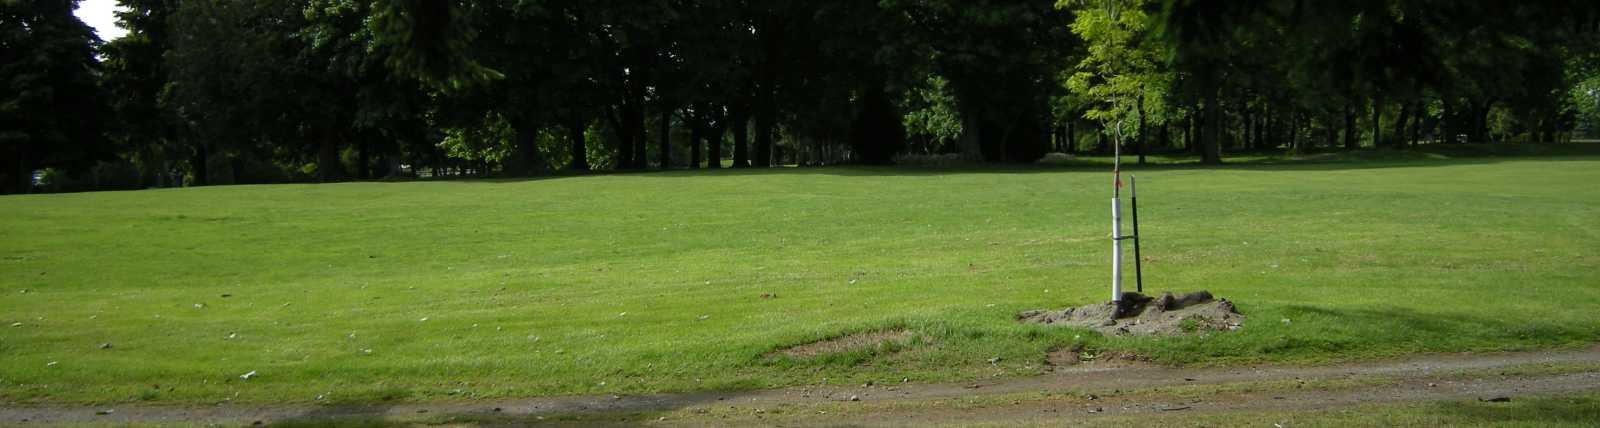 Foster Memorial Park